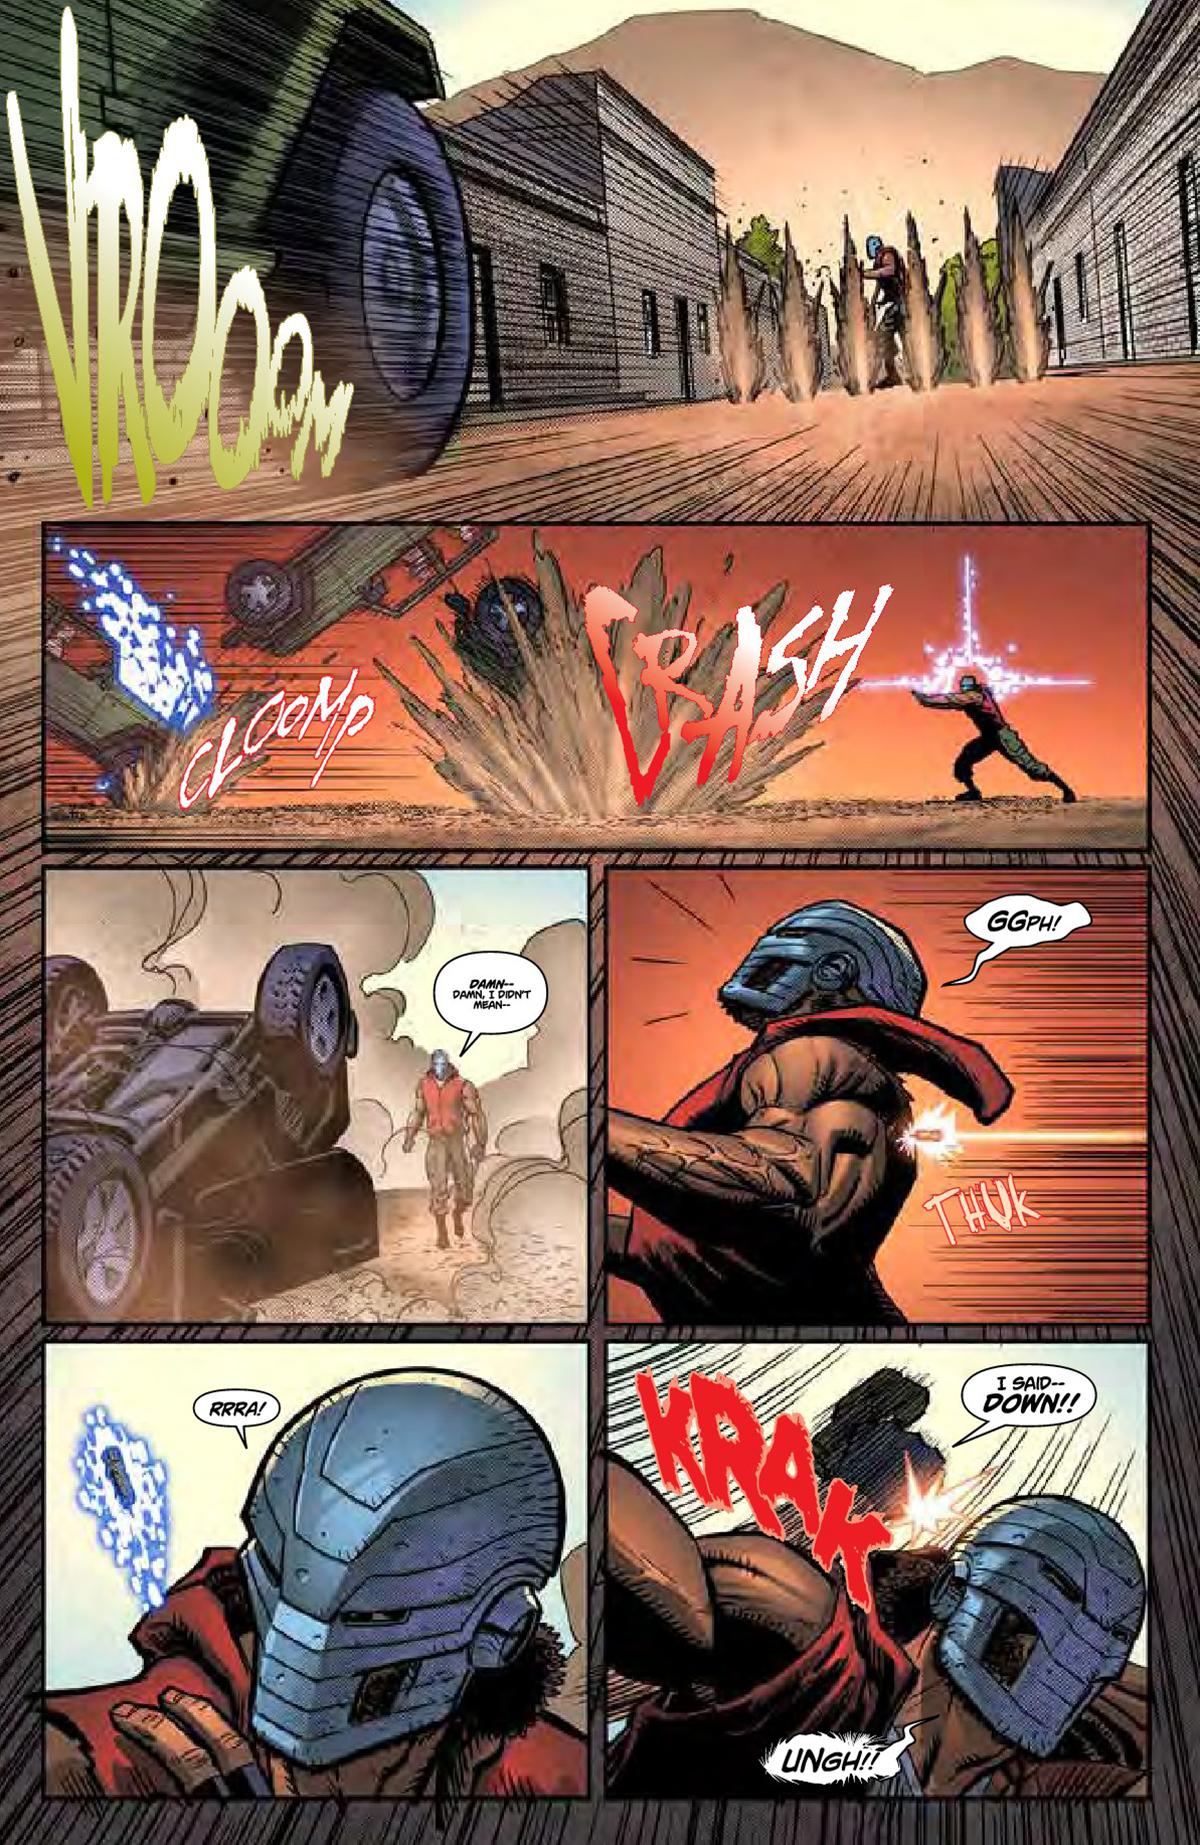 Noble-pg-11